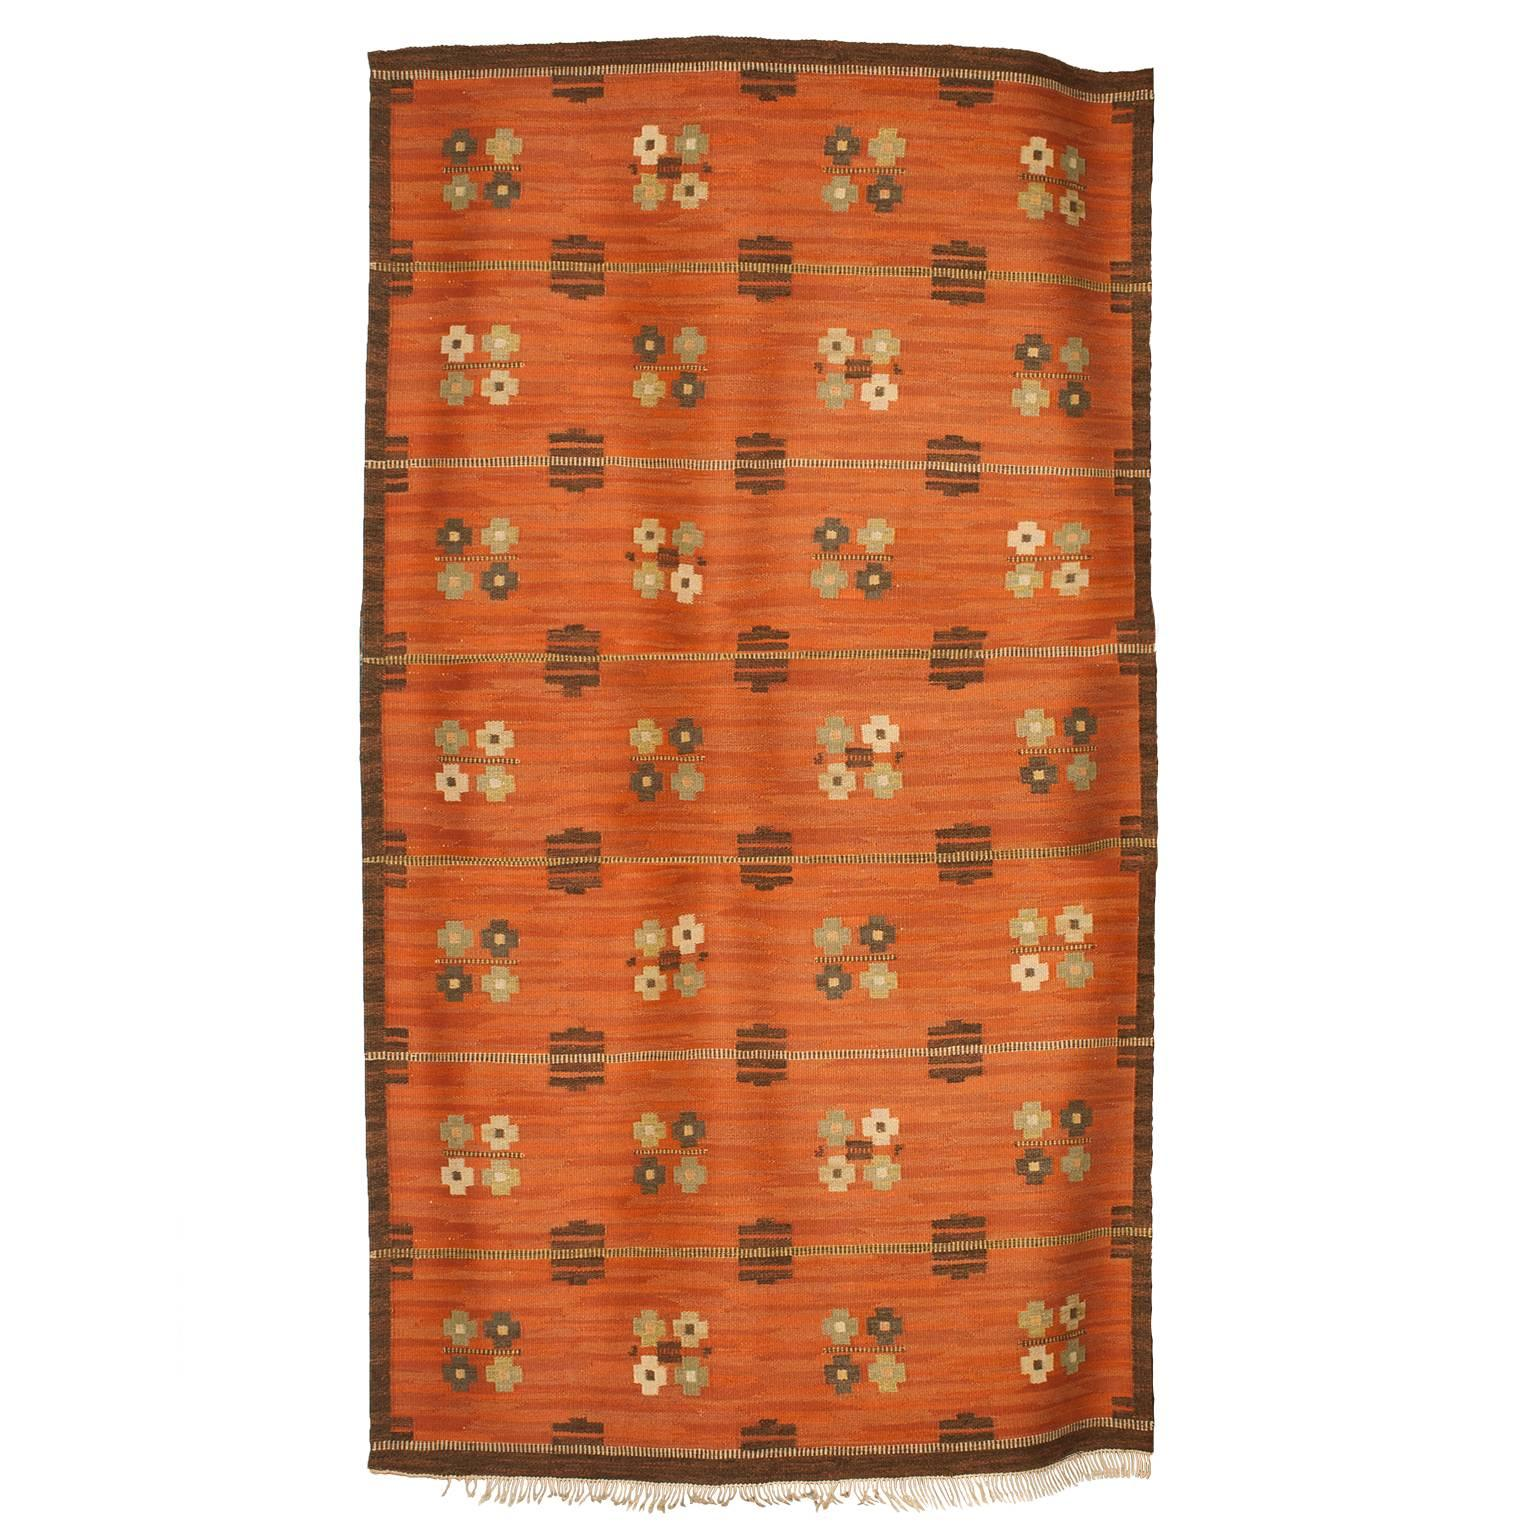 Scandinavian Modern Wool Flat-Weave Rug with Pattern on a Terra Cotta Ground